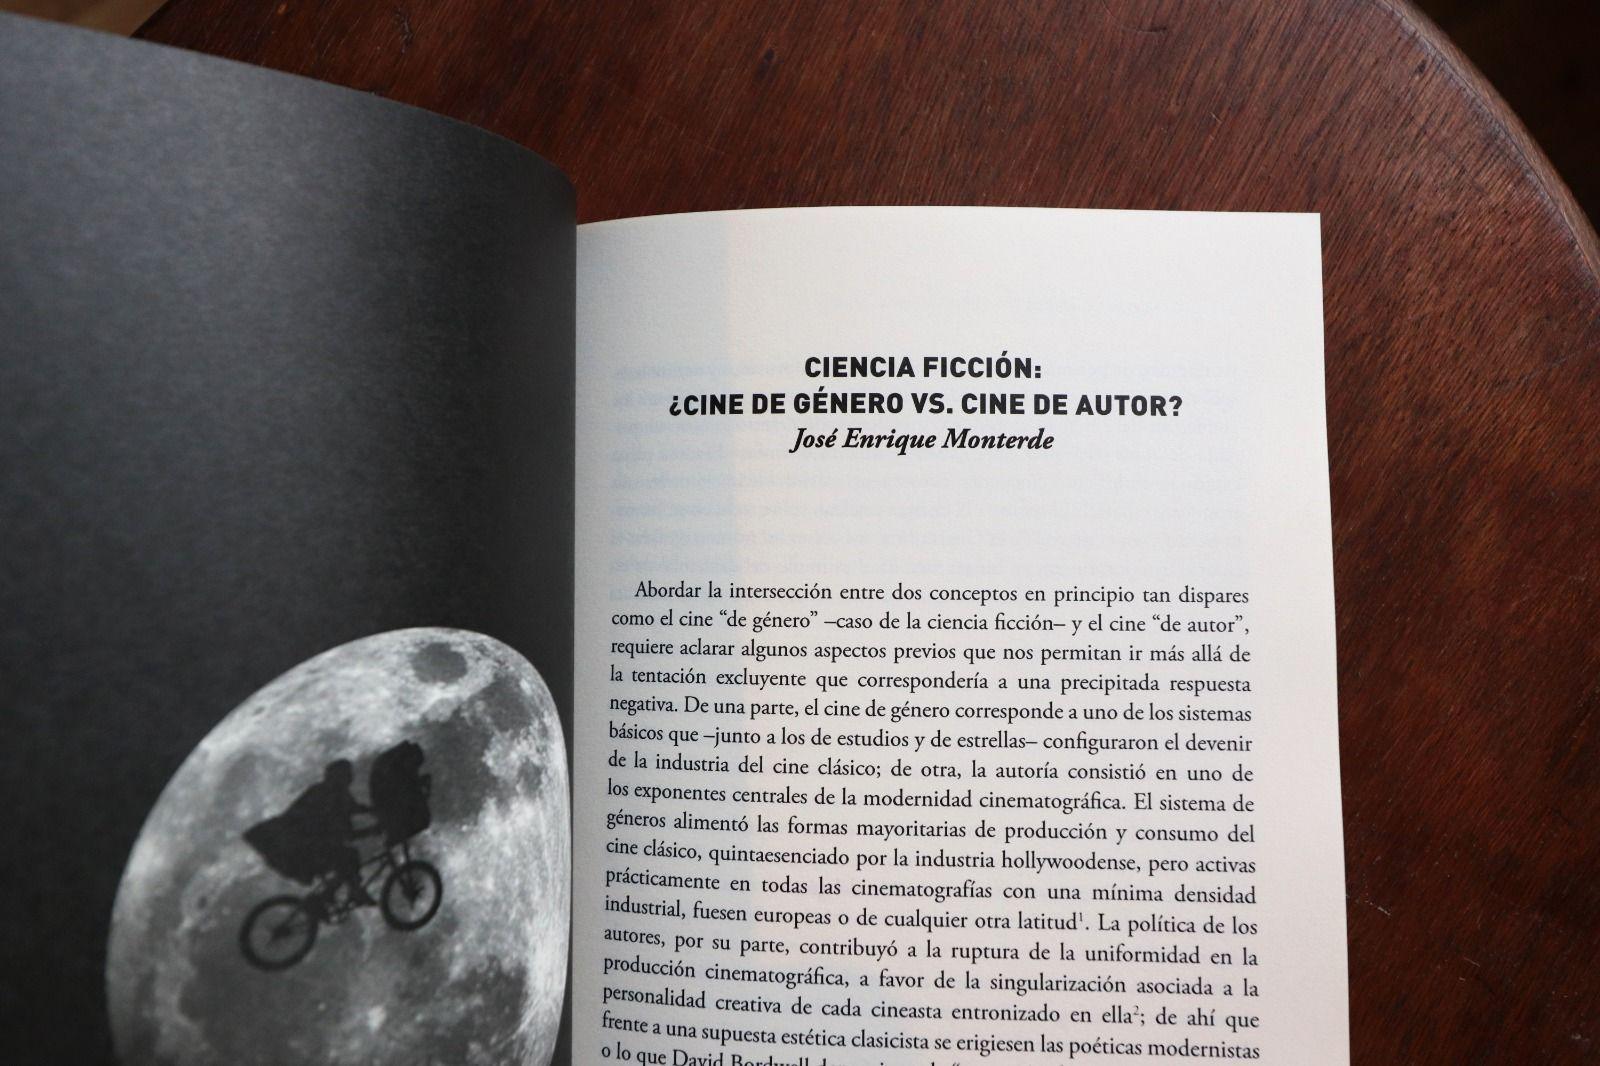 Imaginar Mundos – Sans Soleil Ediciones 2019-05-14 at 19.45.44 (21)